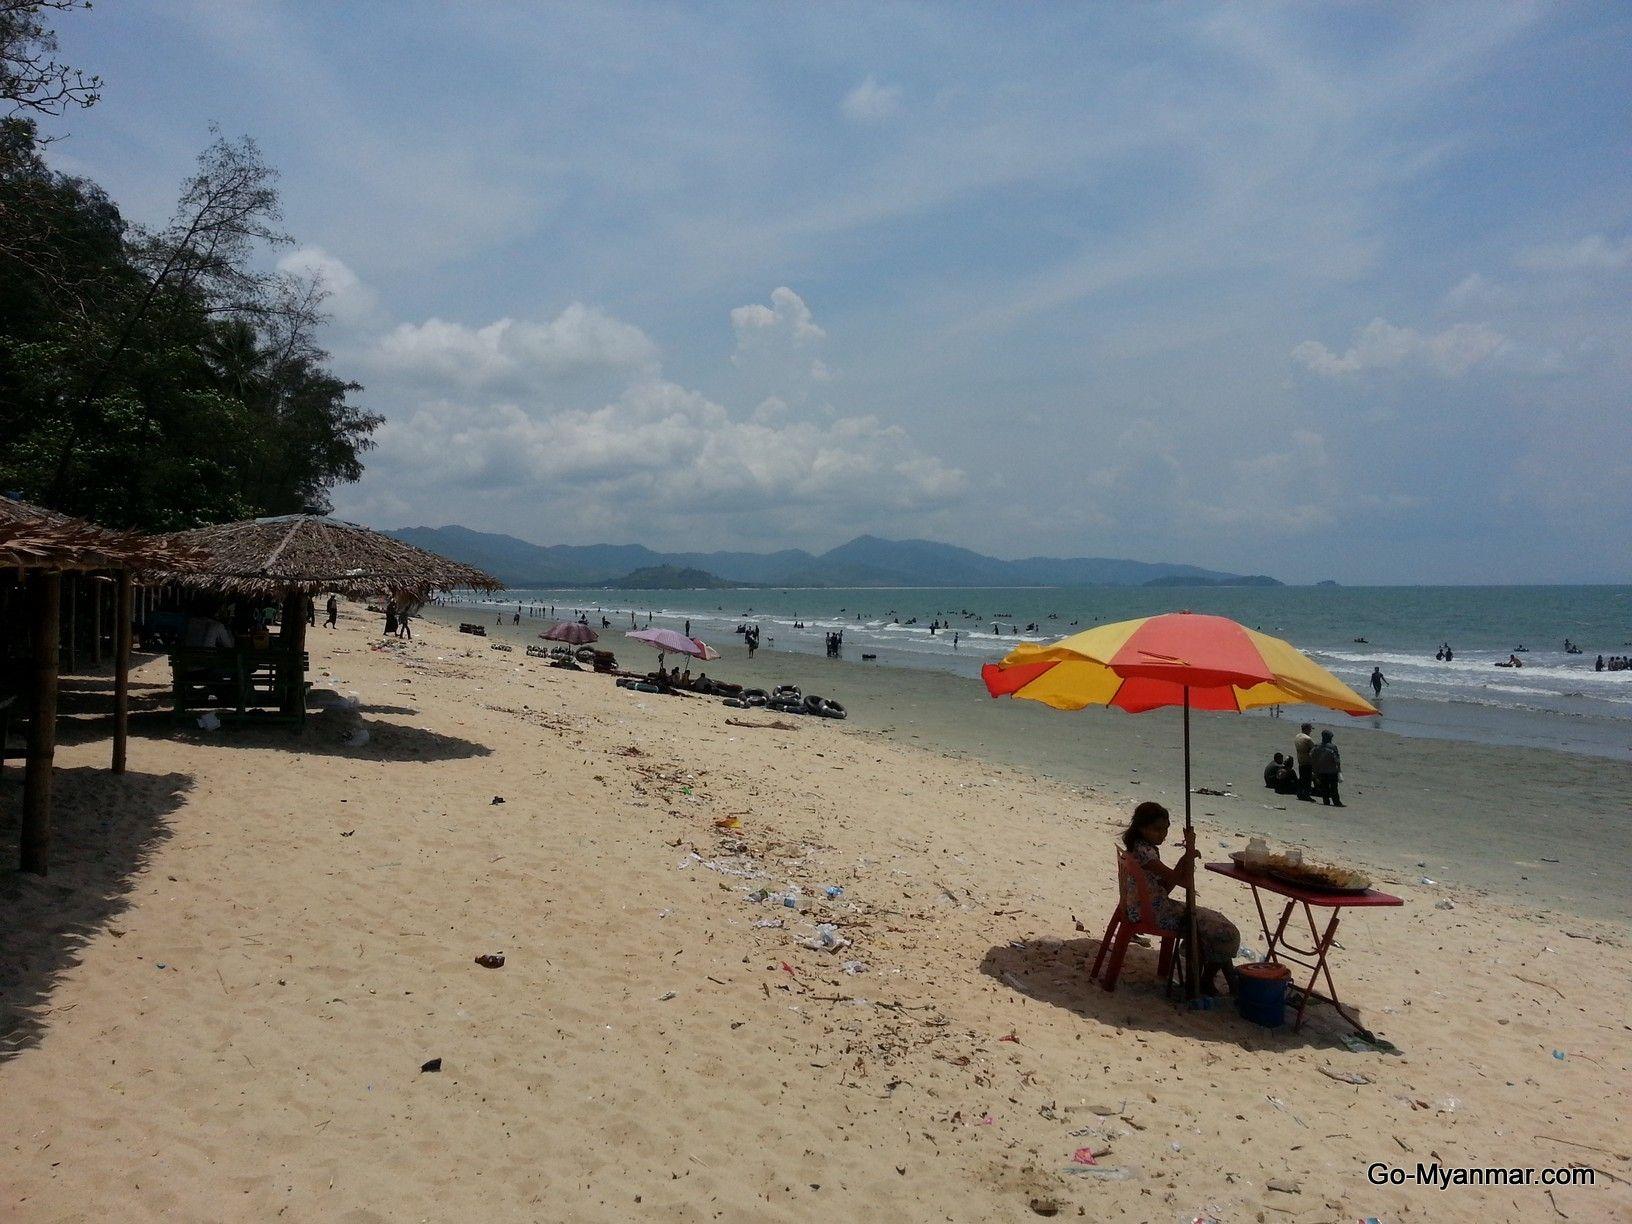 Maungmagan beach near dawei tanintharyi tenasserim division maungmagan beach near dawei tanintharyi tenasserim division myanmar burma altavistaventures Image collections